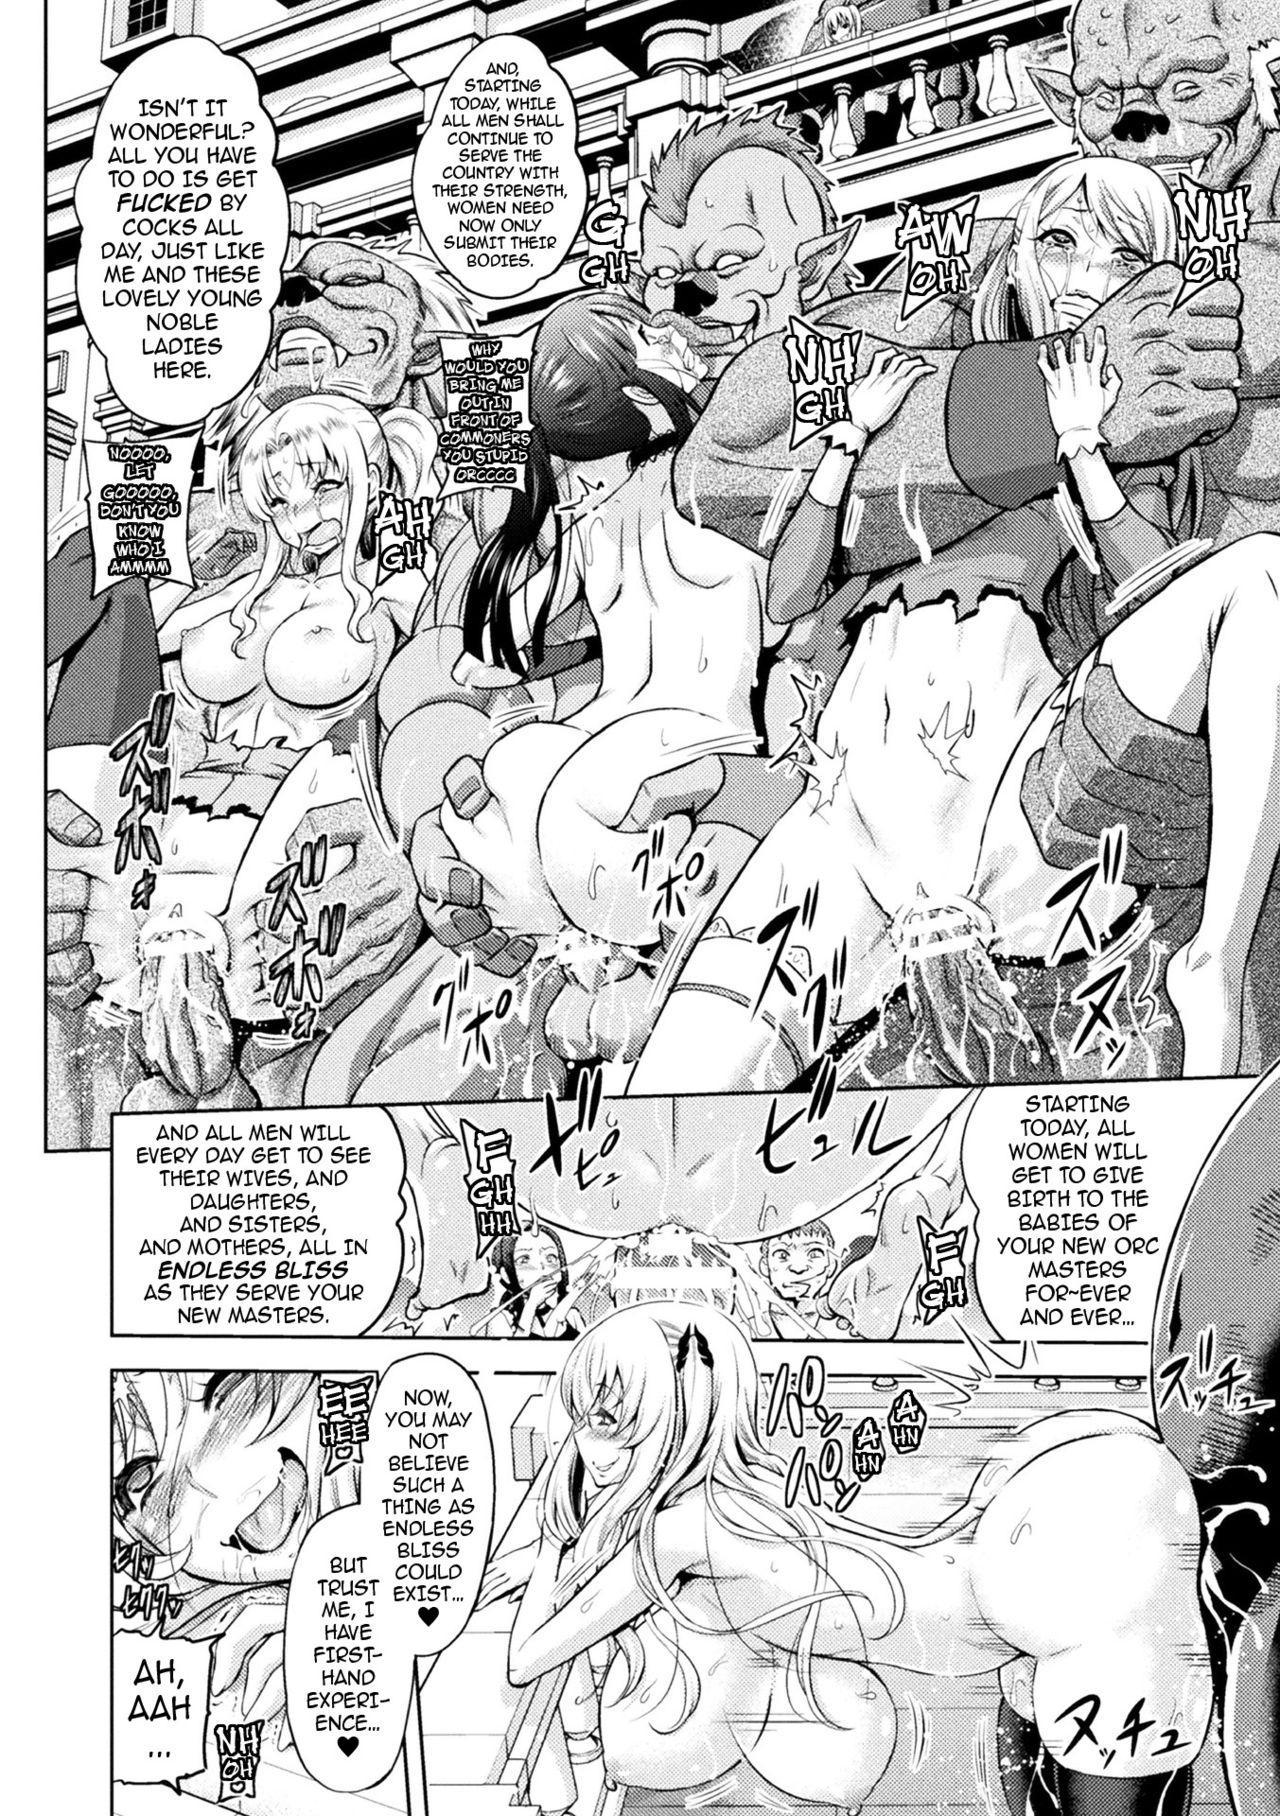 [Yamada Gogogo] Erona ~Orc no Inmon ni Okasareta Onna Kishi no Matsuro~   Erona ~The Fall of a Beautiful Knight Cursed with the Lewd Mark of an Orc~ Ch. 1-6 [English] {darknight} 102